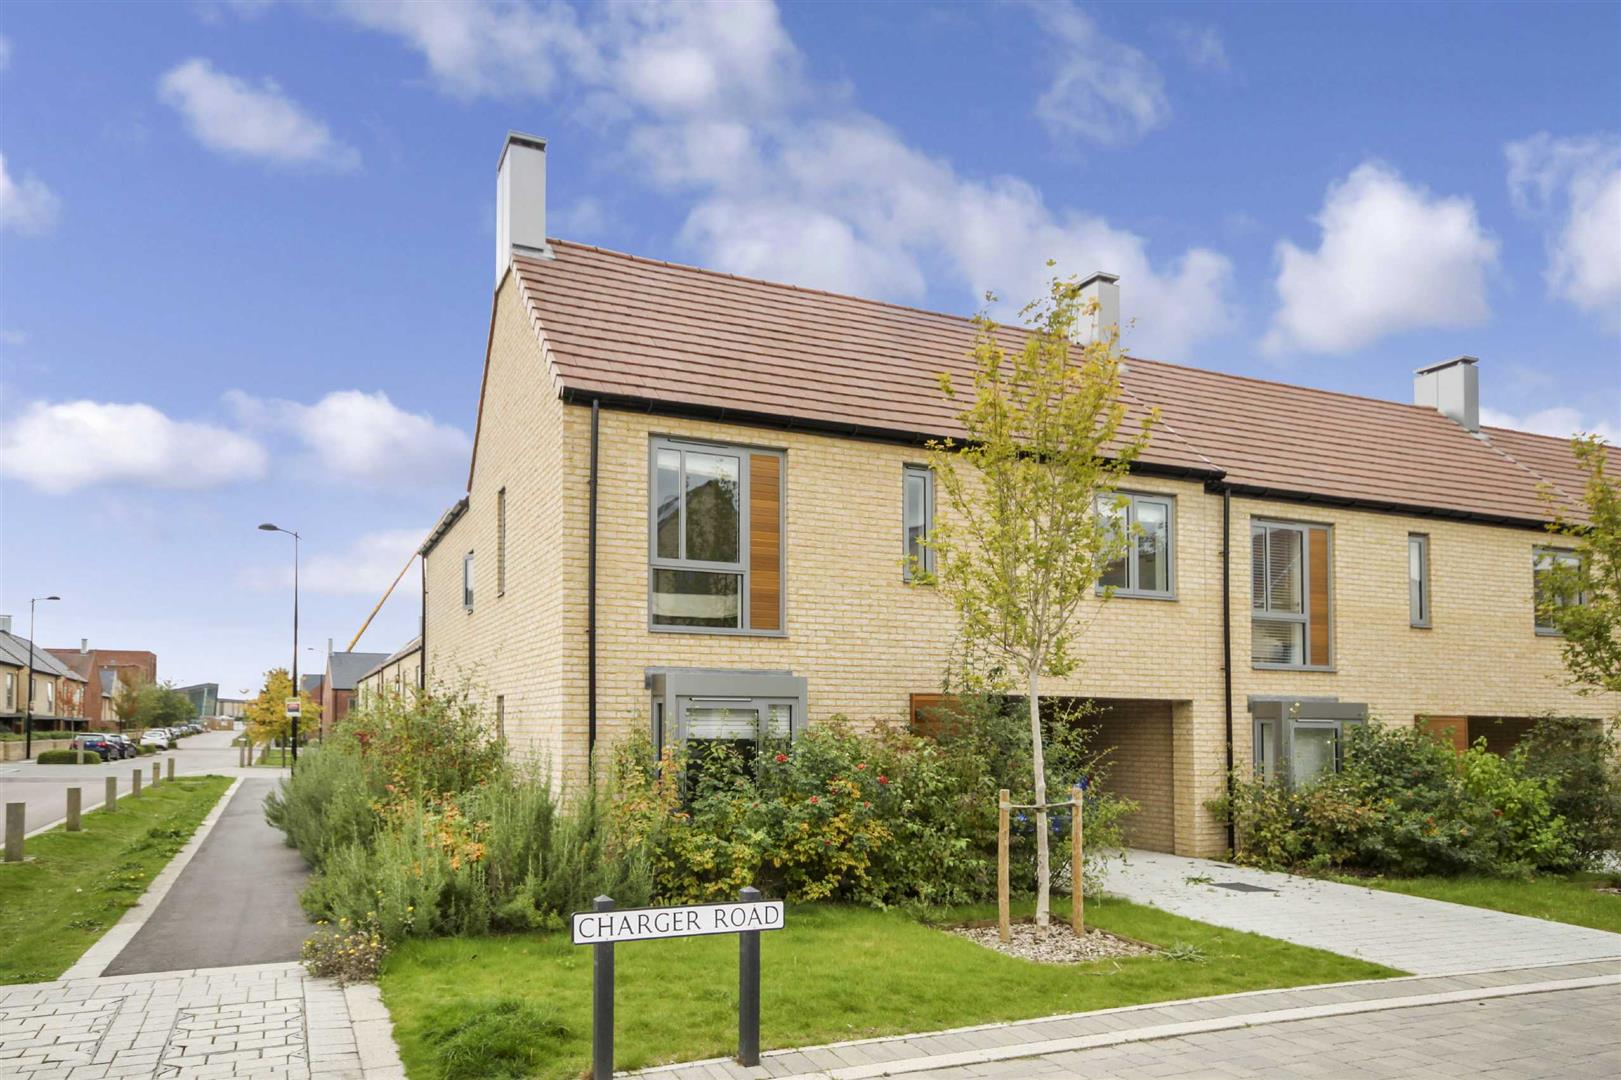 3 Bedroom House For Sale Charger Road Trumpington Cambridge Cb Cb2 9ea